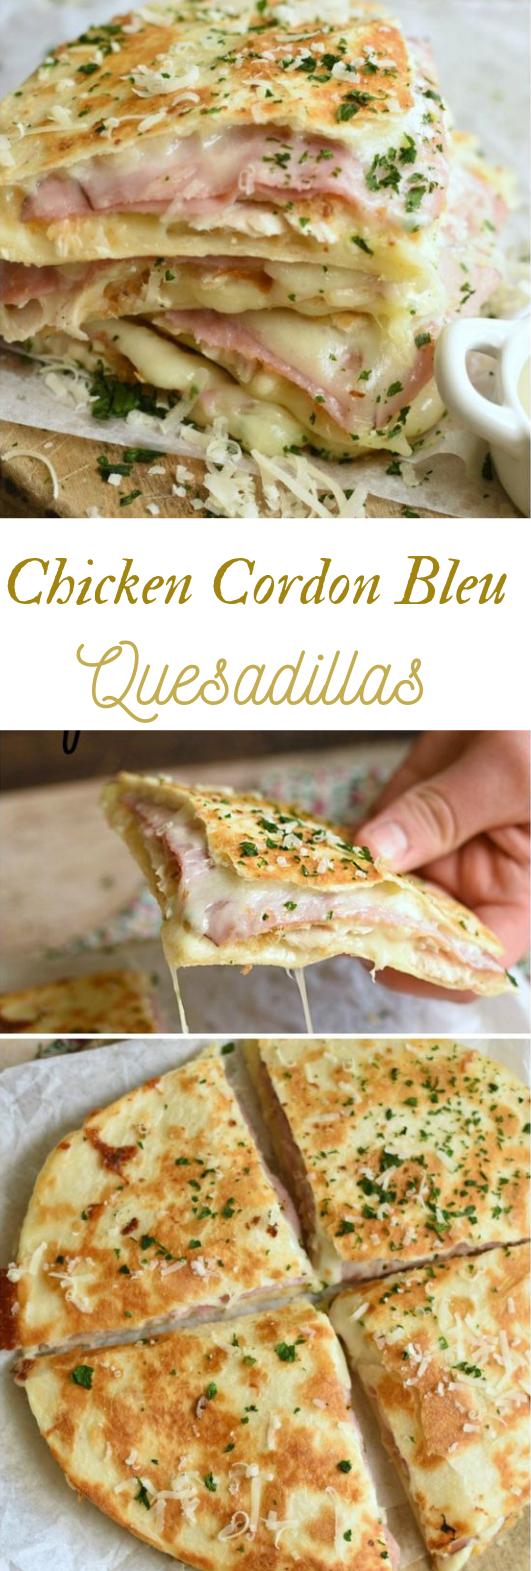 CHICKEN CORDON BLEU QUESADILLAS #chicken #dinner